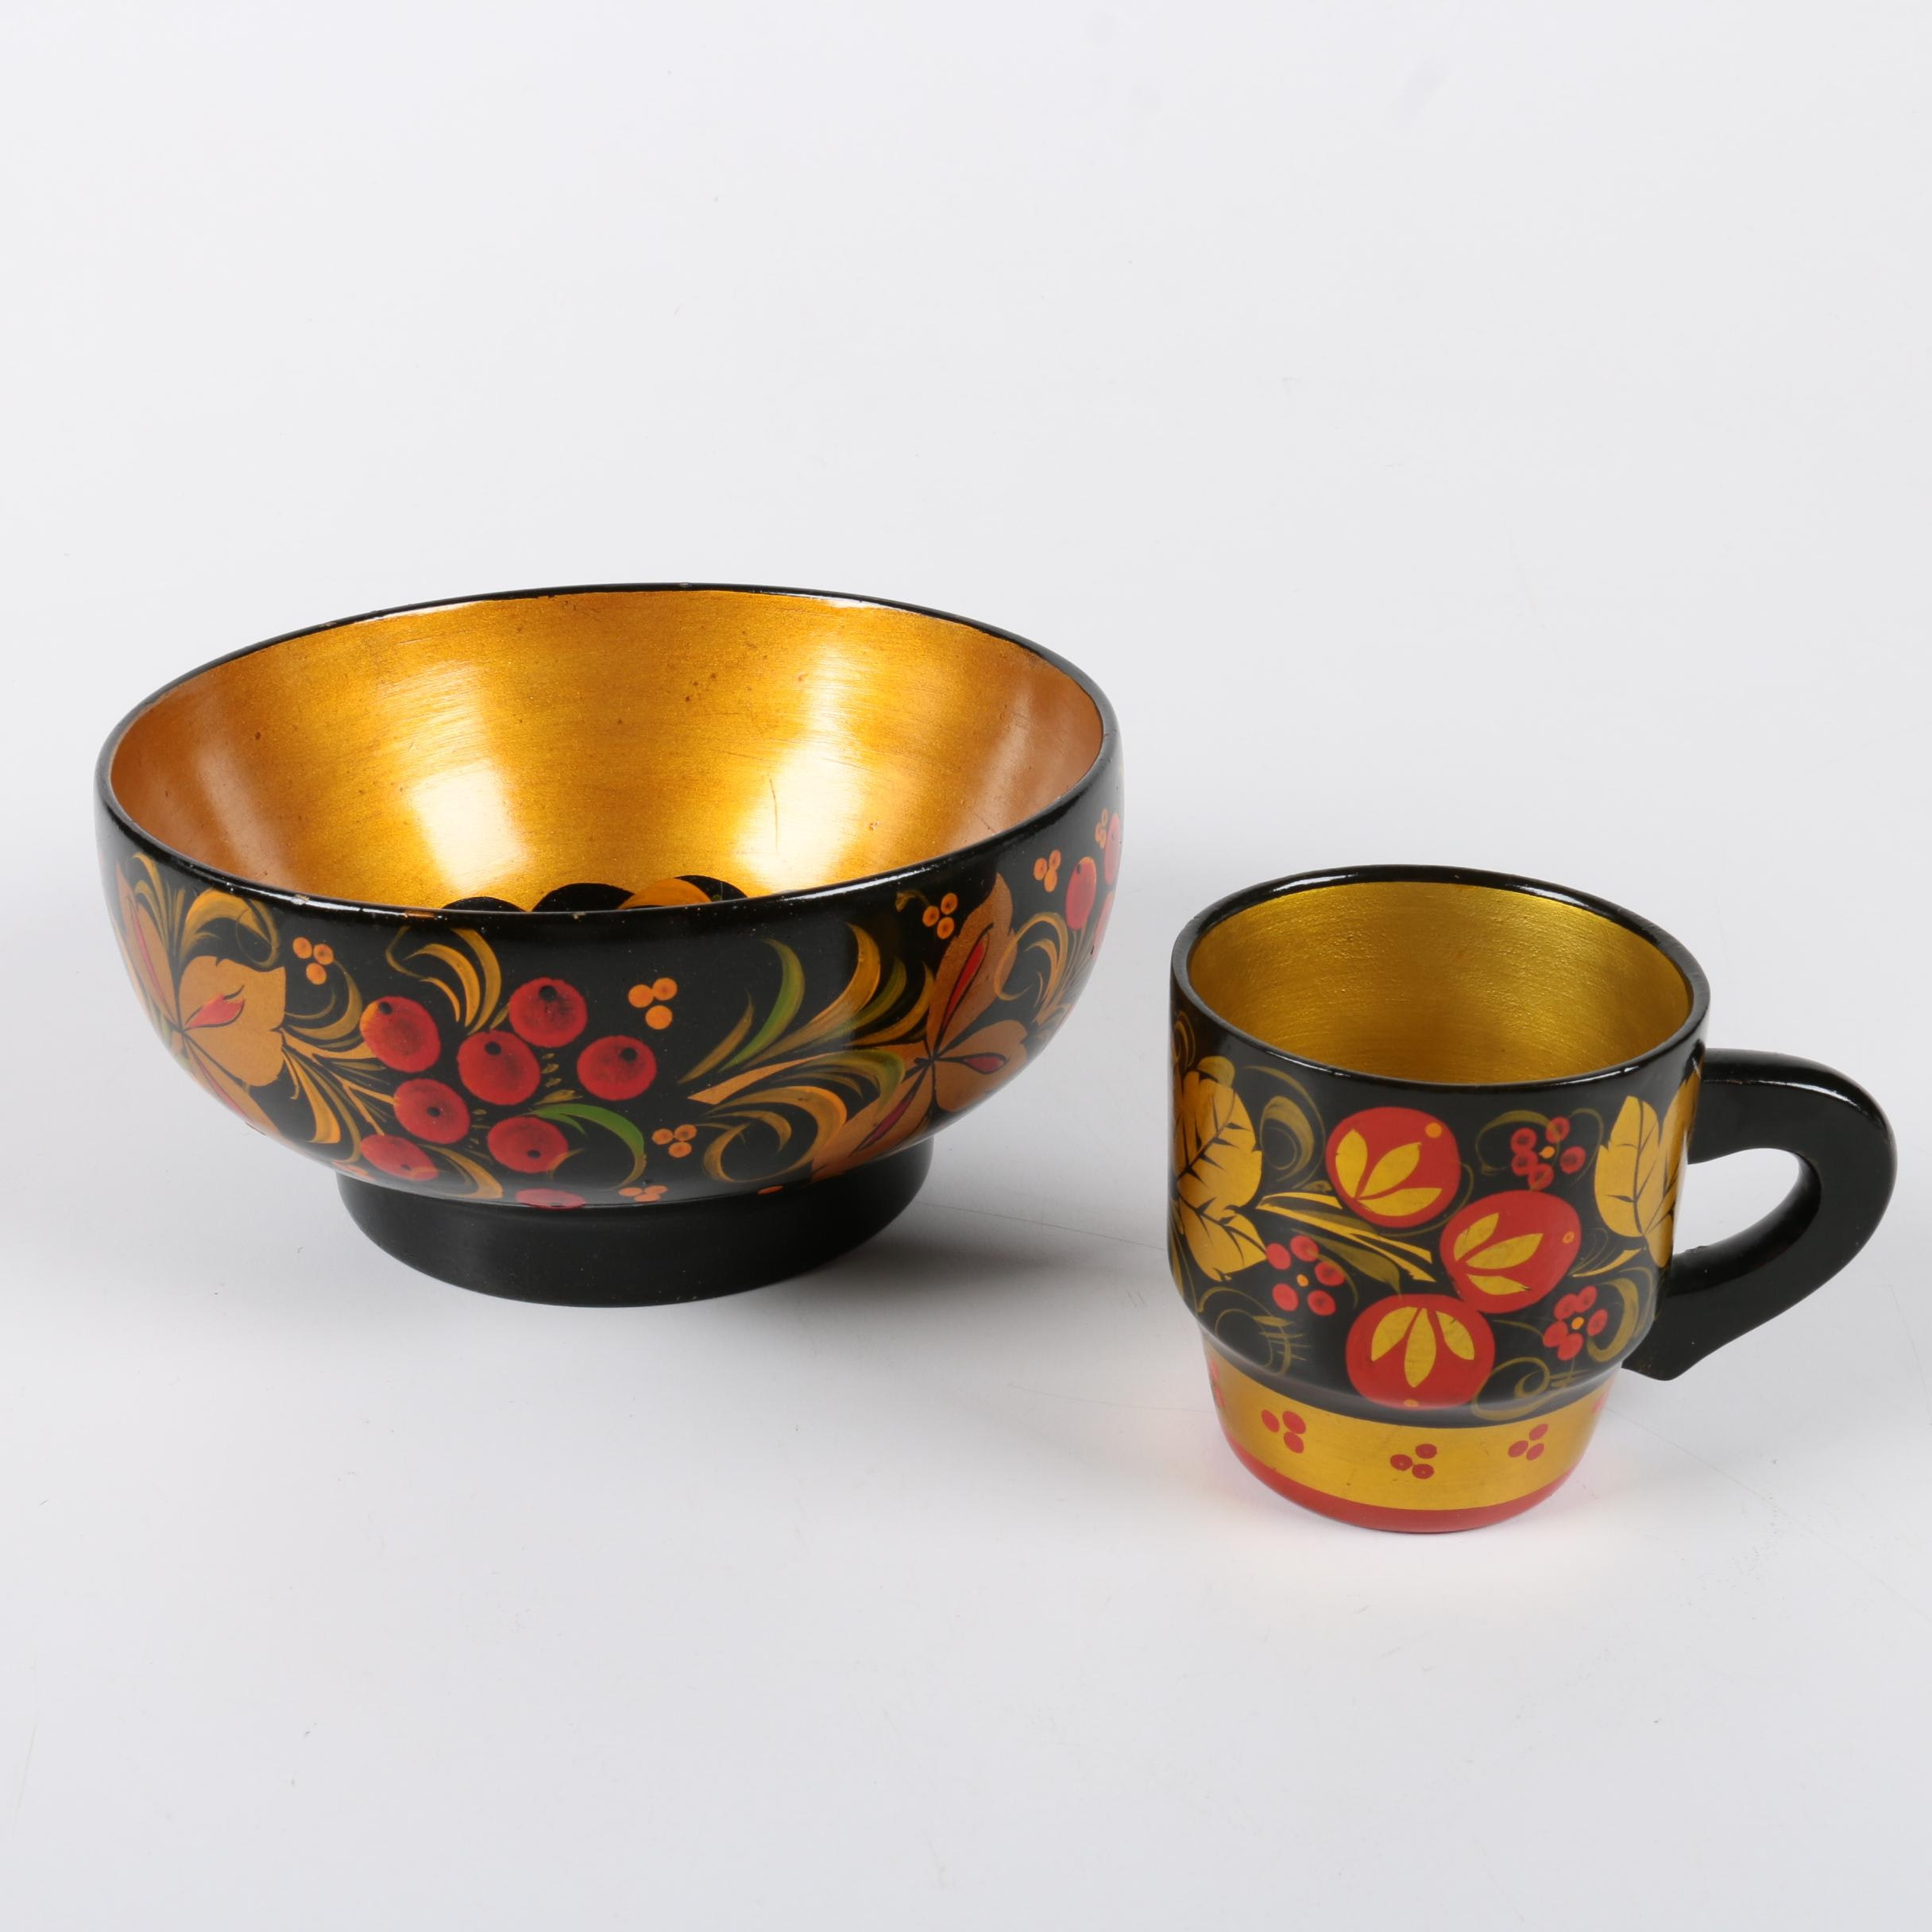 Khokhloma Wooden Bowl and Cup